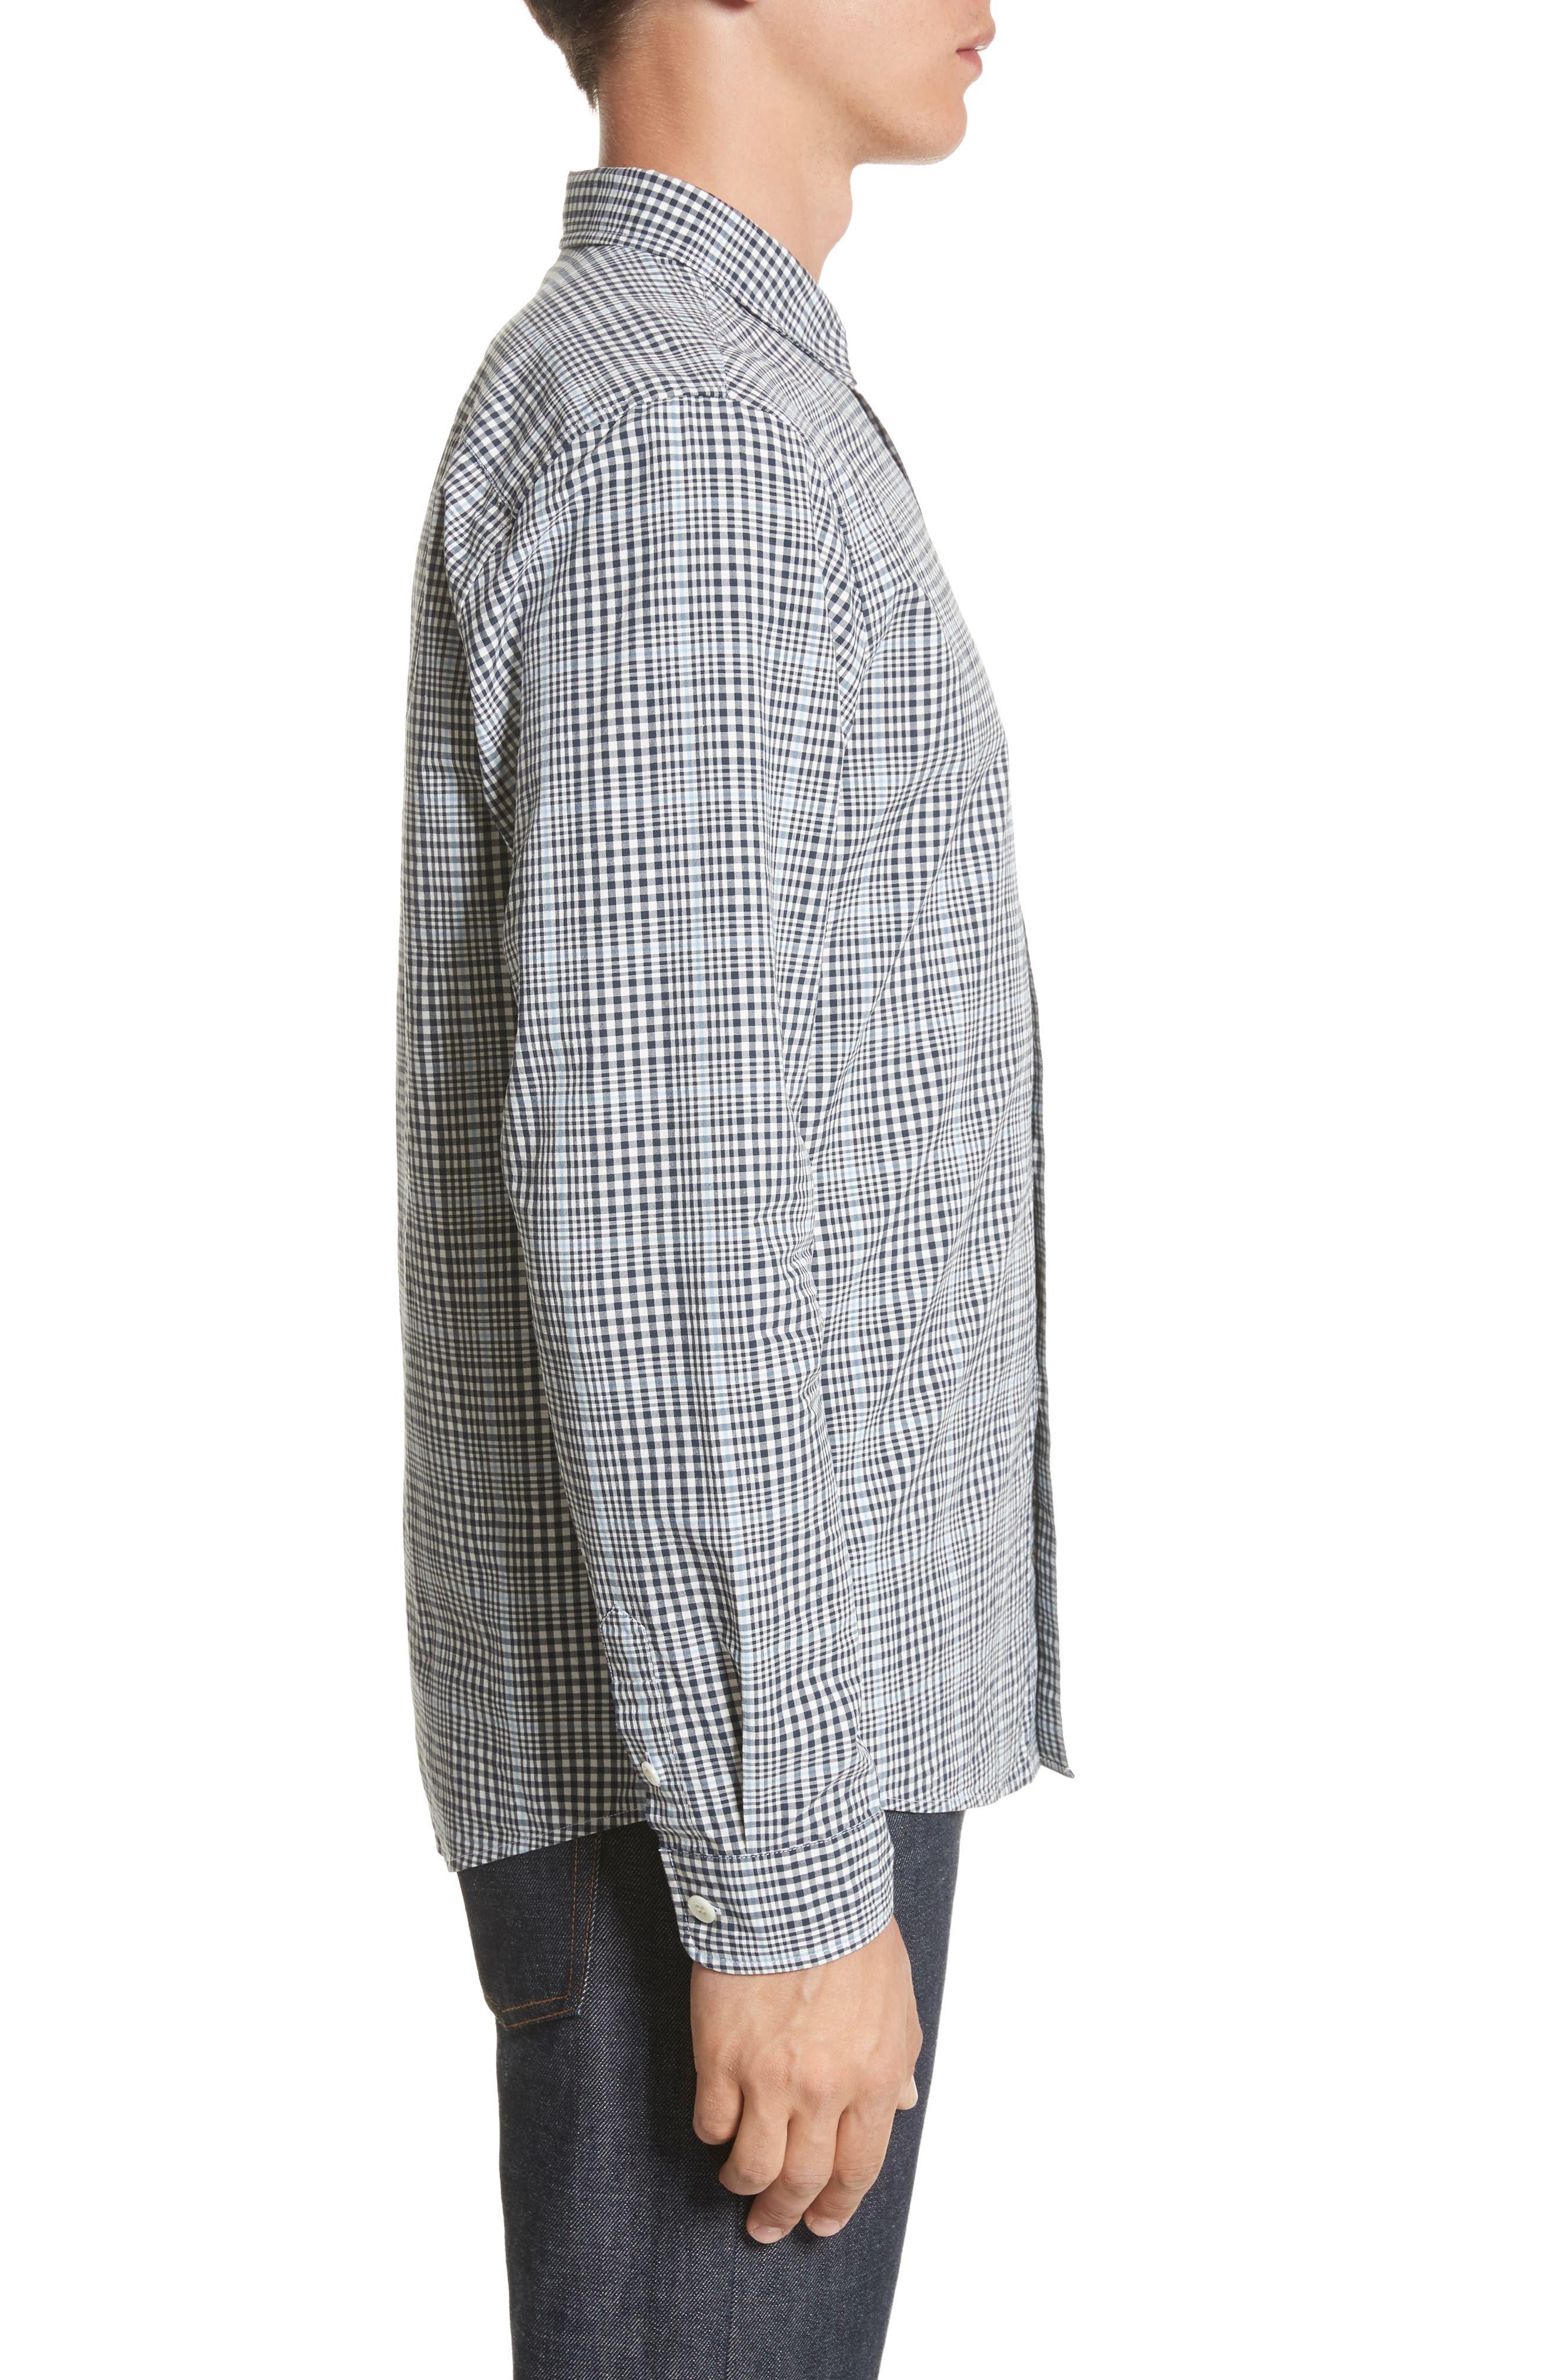 John Check Woven Shirt,                             Alternate thumbnail 3, color,                             410